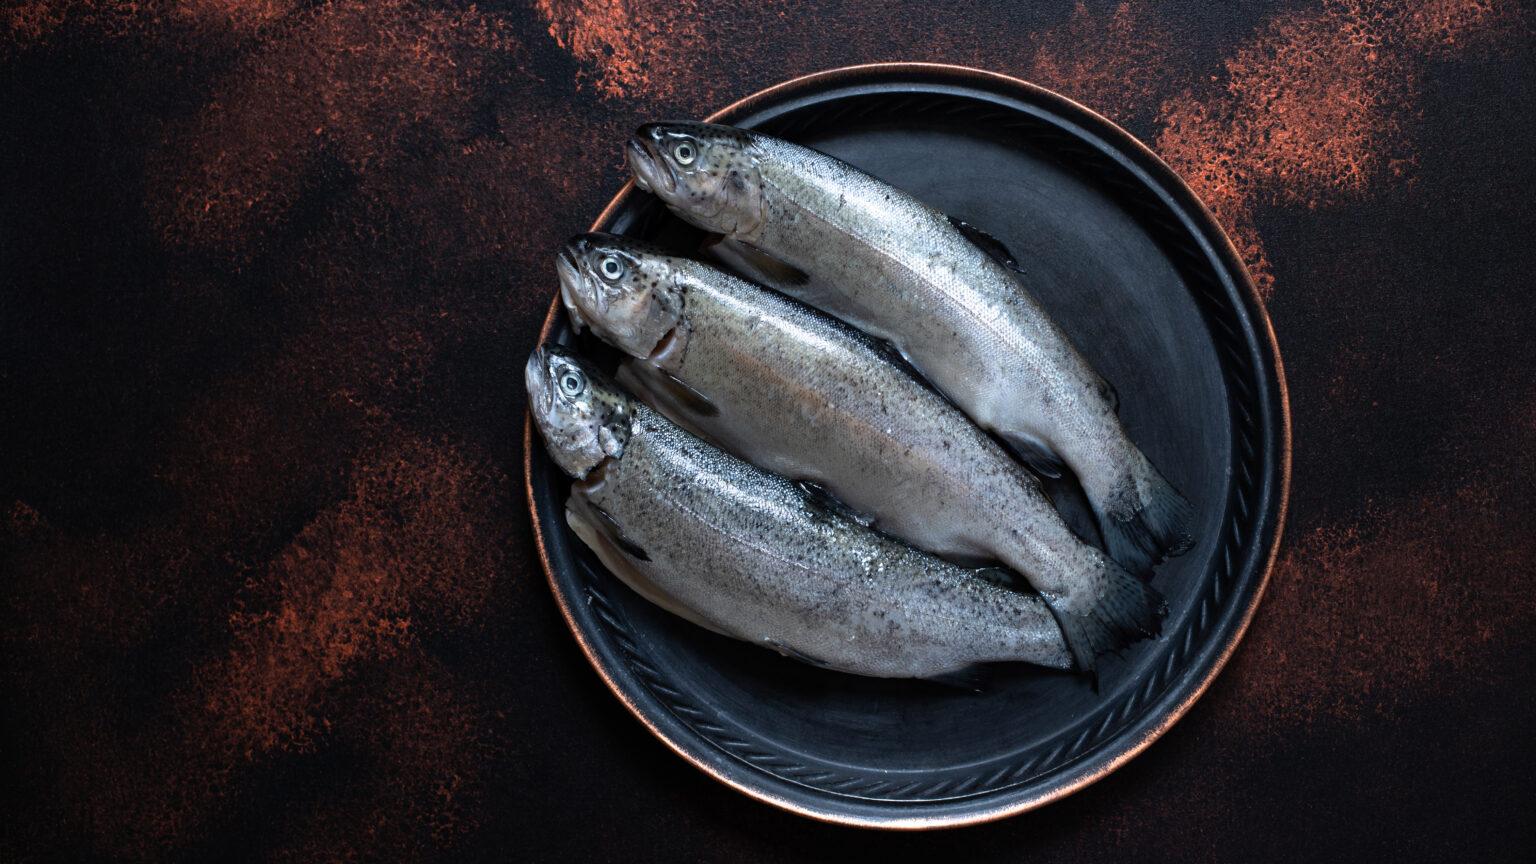 three-fresh-raw-trouts-vintage-plate-rustic-dark-background-tasty-fish-ingredient-healthy-dinner